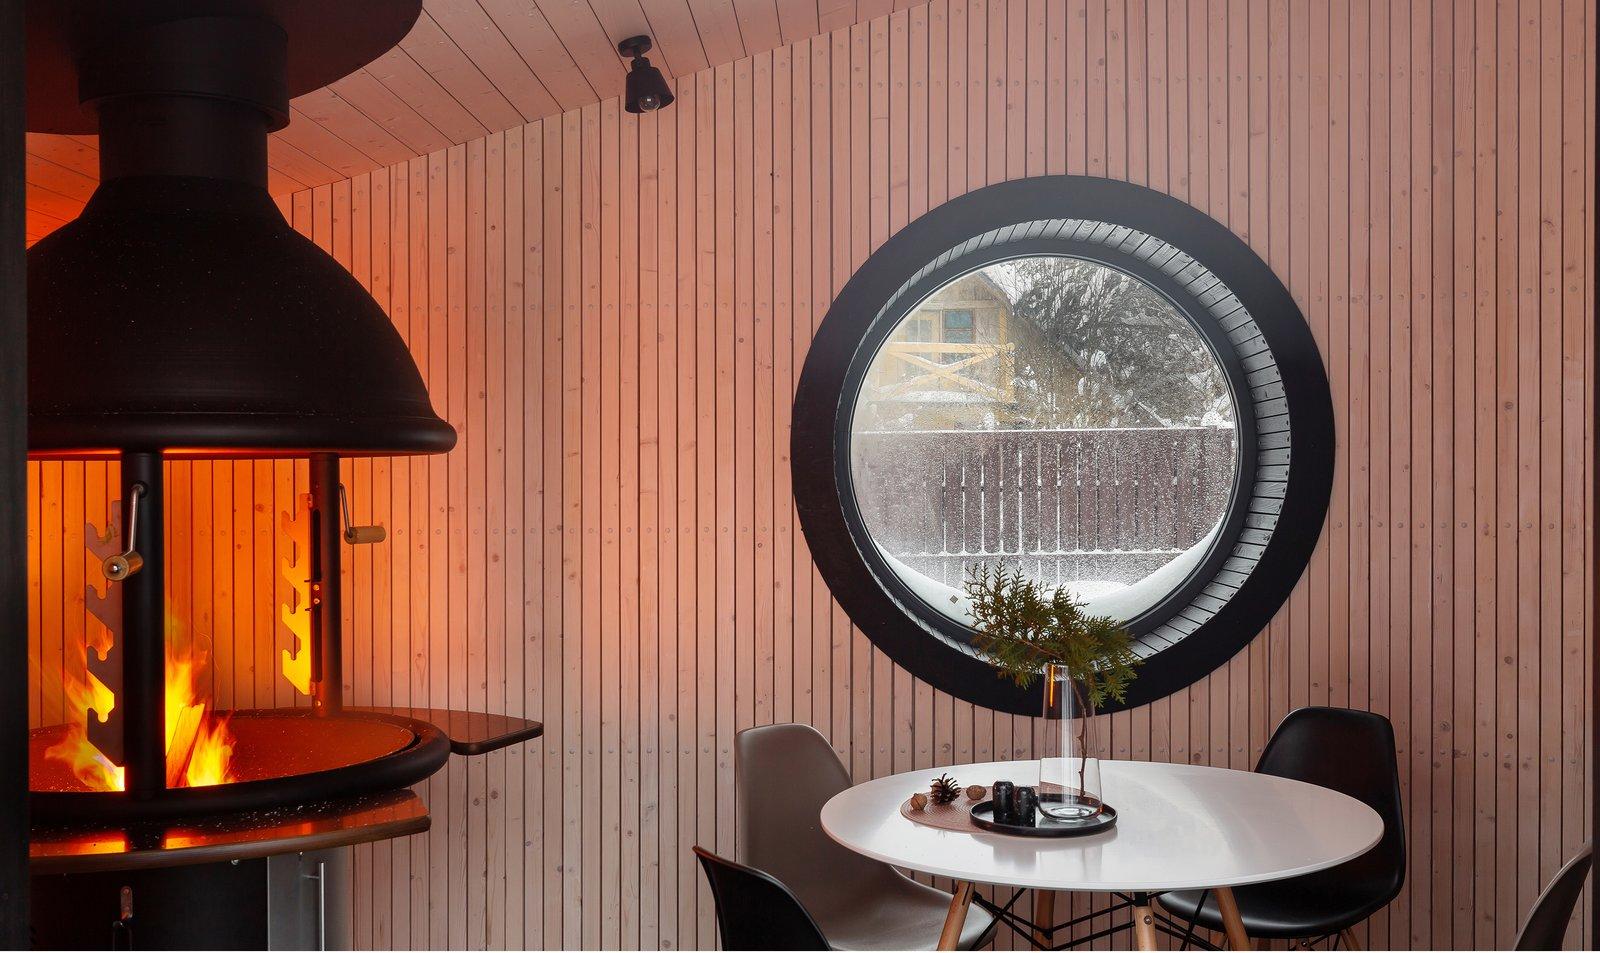 FLEXSE grill house interior